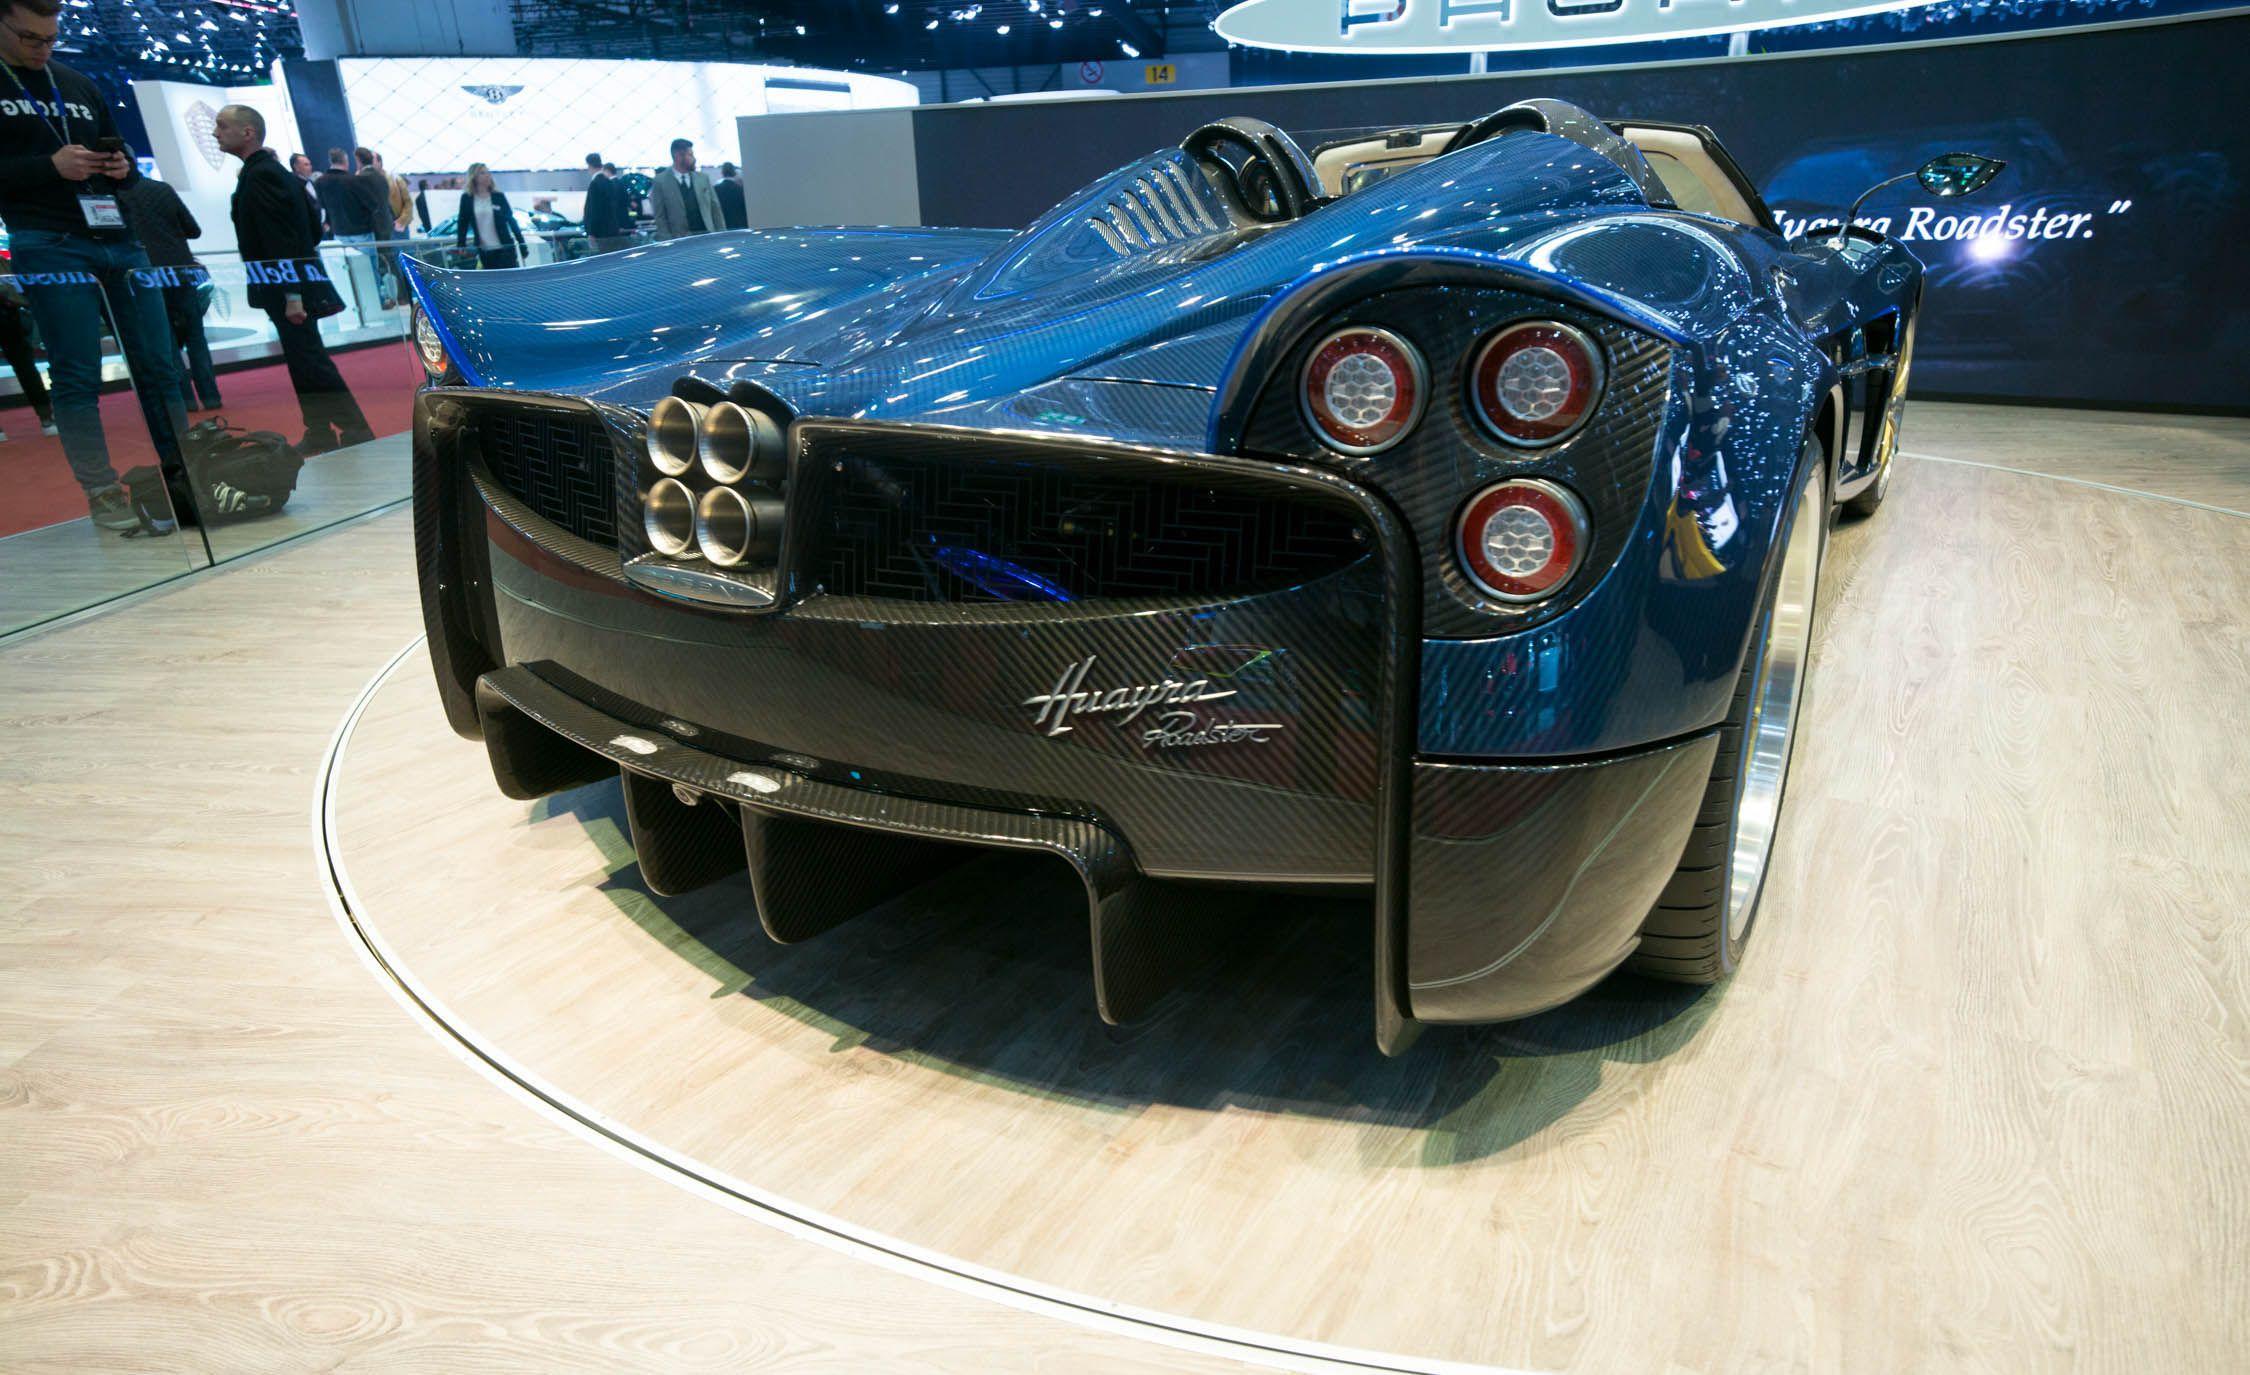 Delightful Pagani Huayra Reviews | Pagani Huayra Price, Photos, And Specs | Car And  Driver